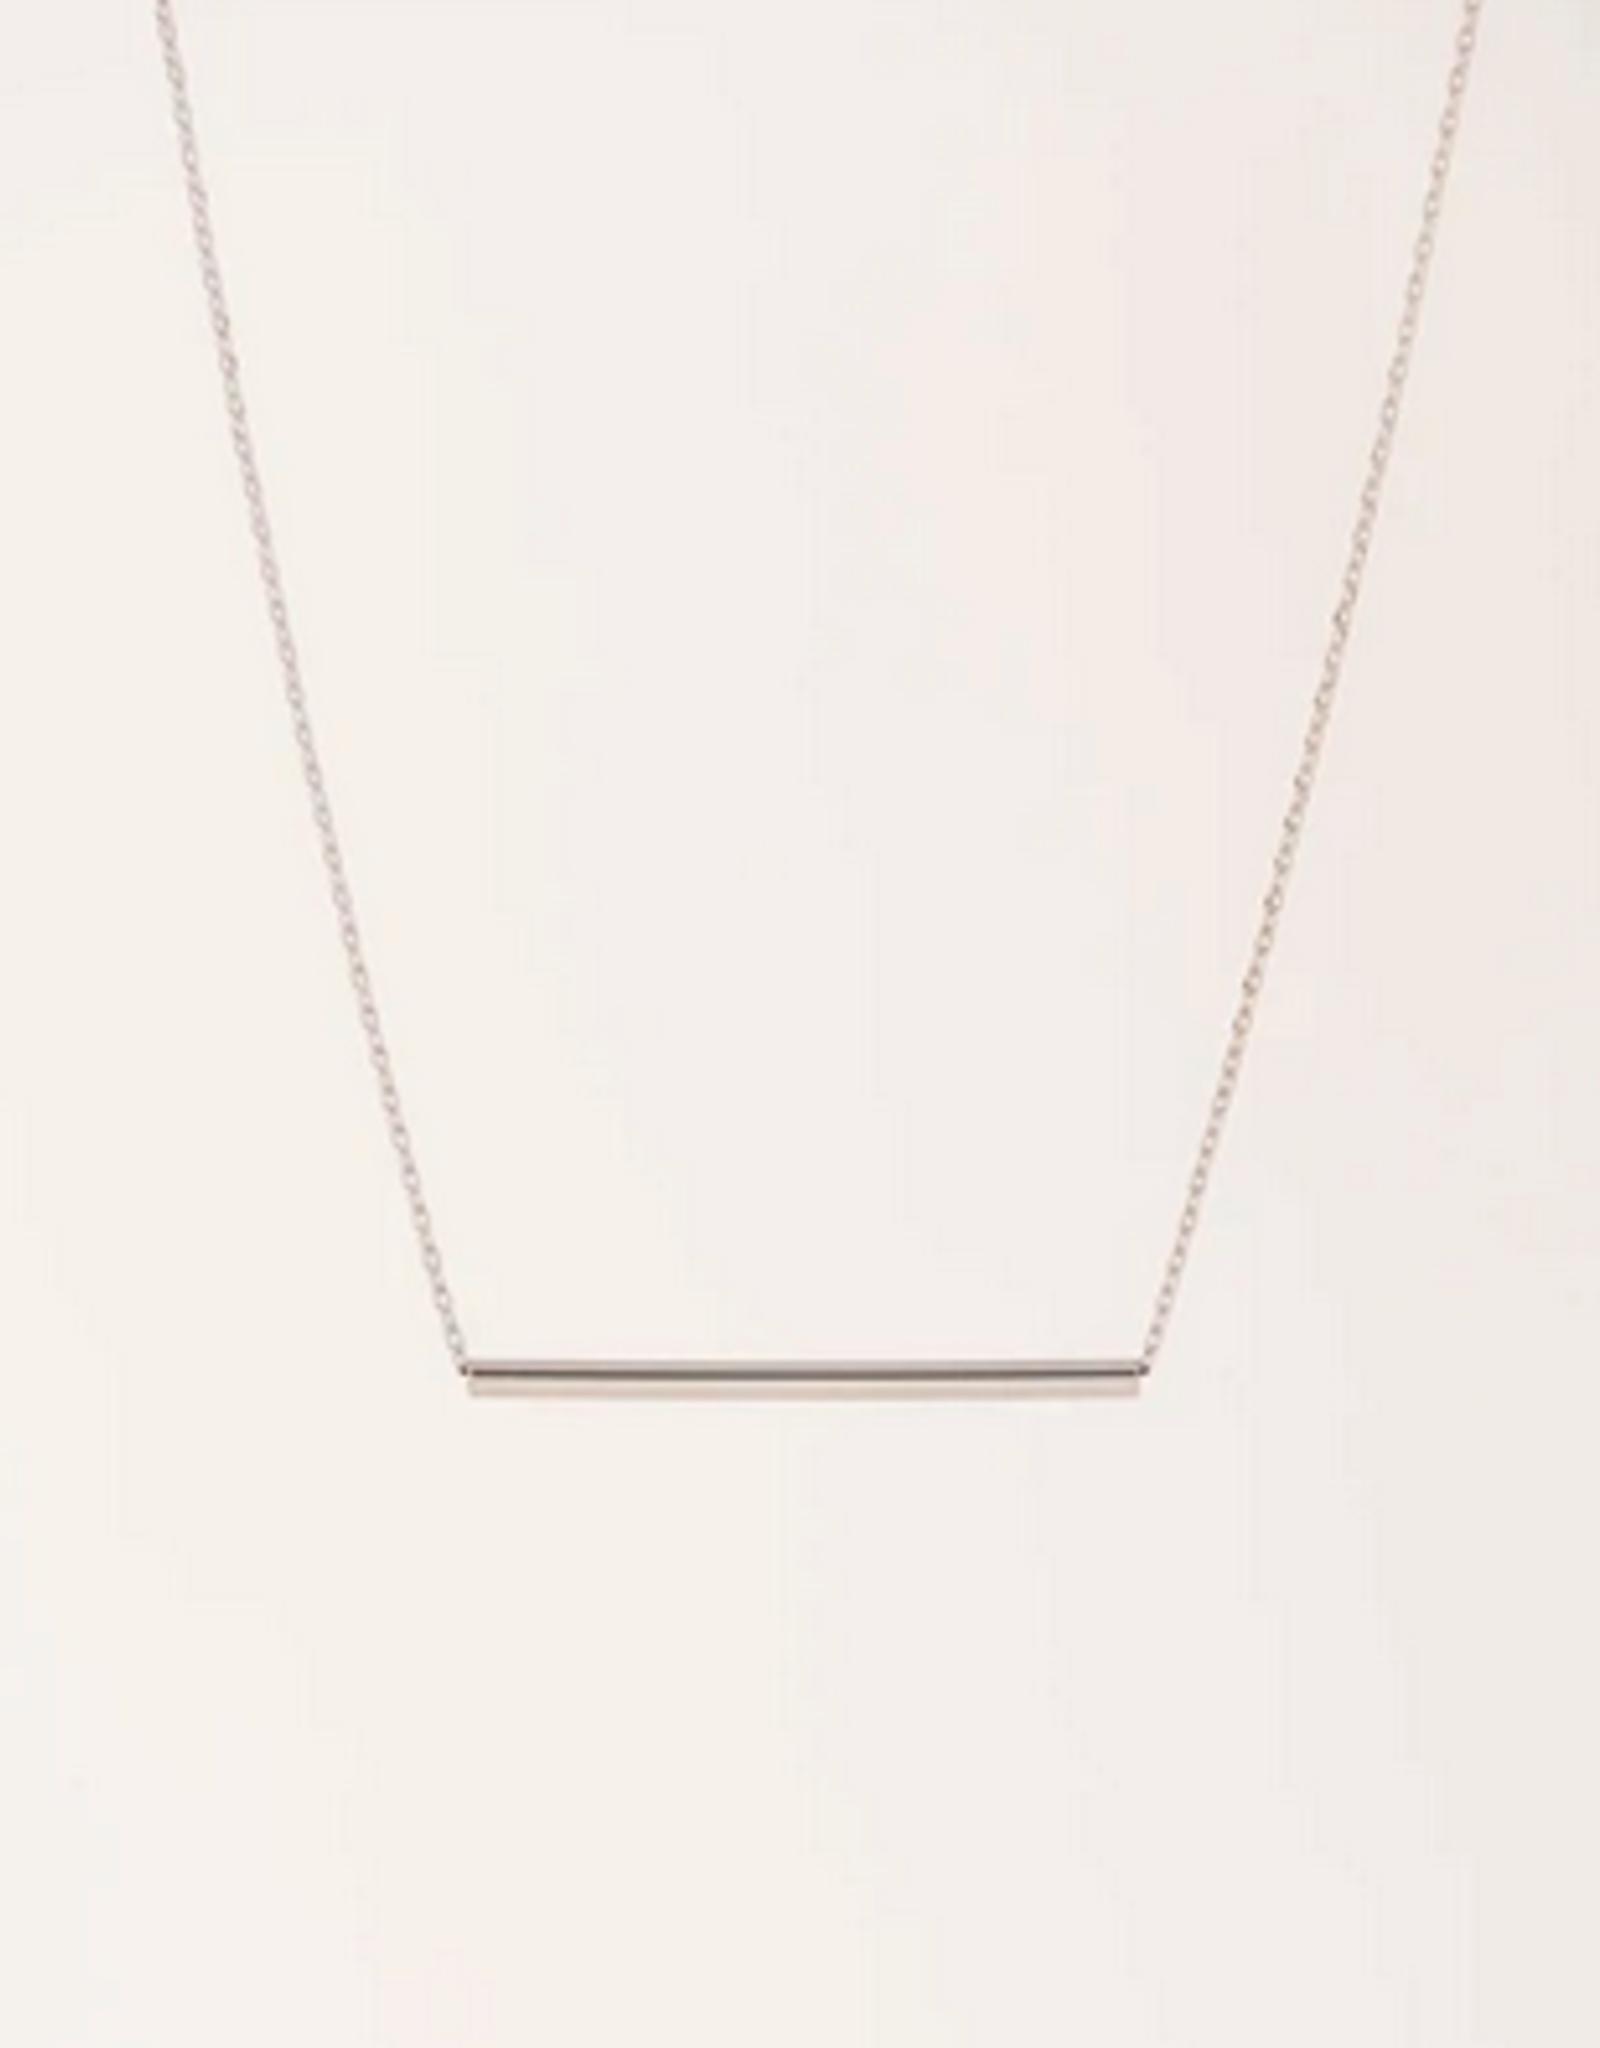 Serra Pipe Neckace - Silver